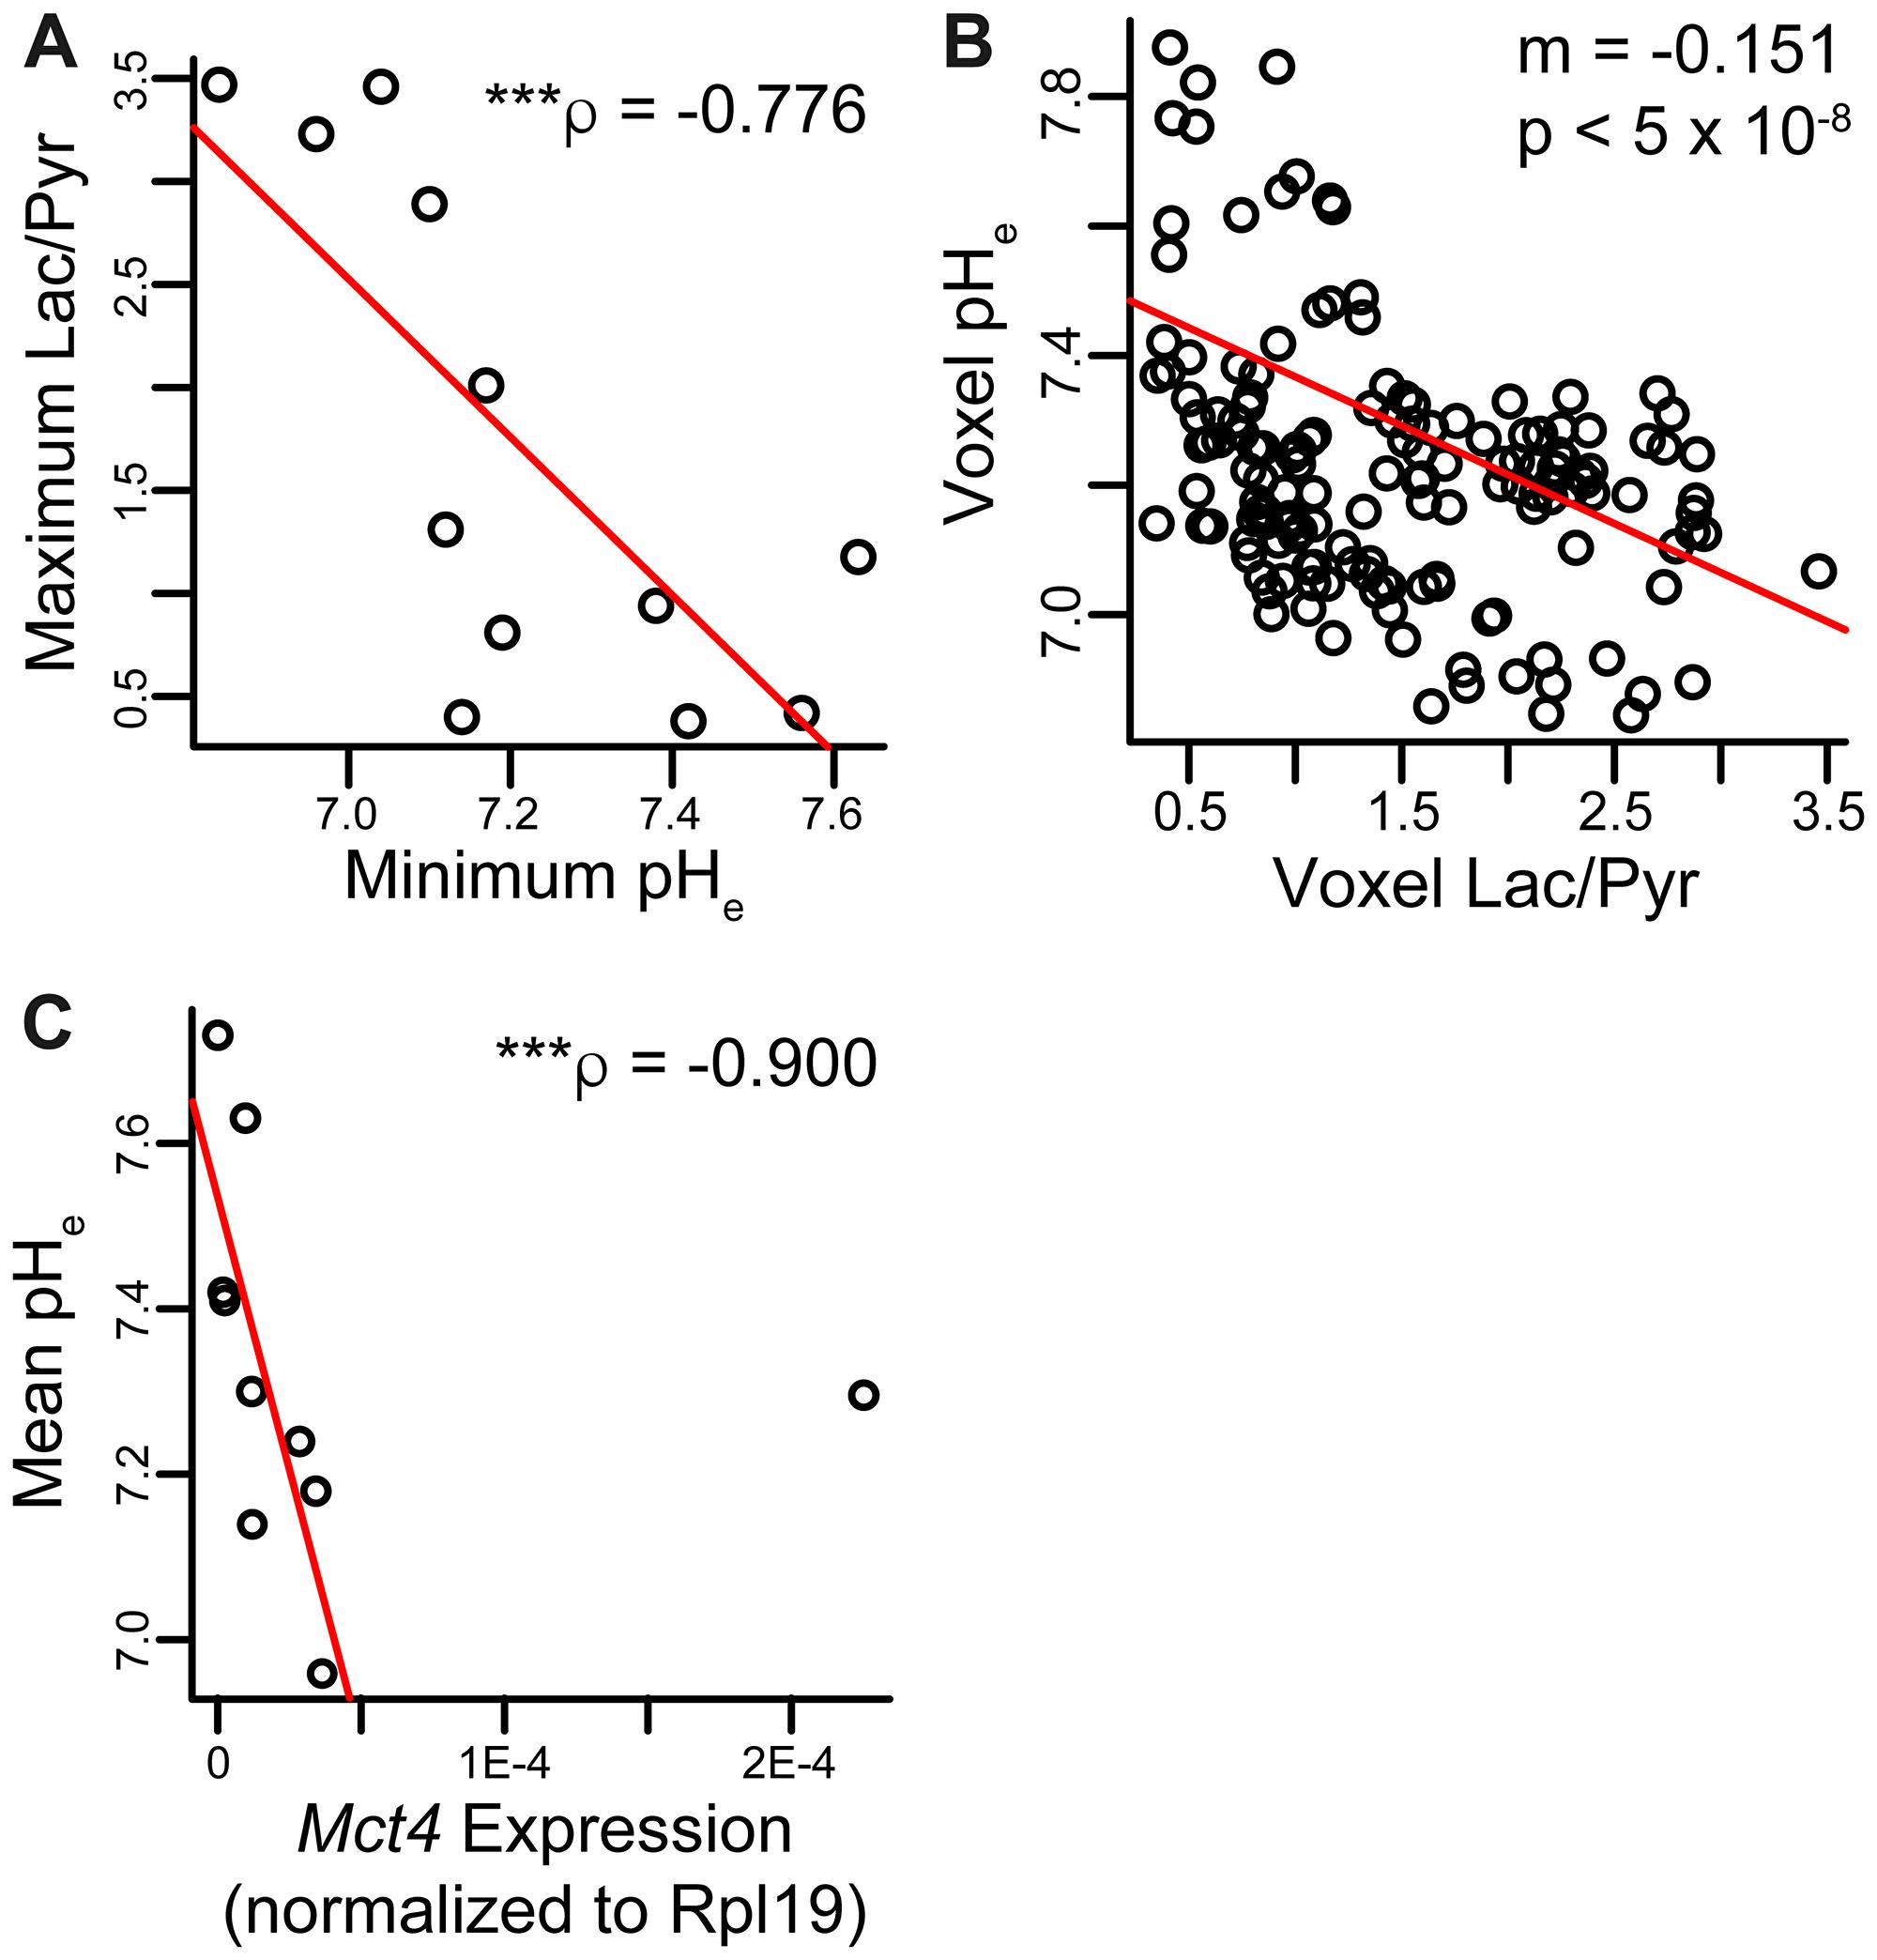 Correlations between metabolic parameters and pHe.